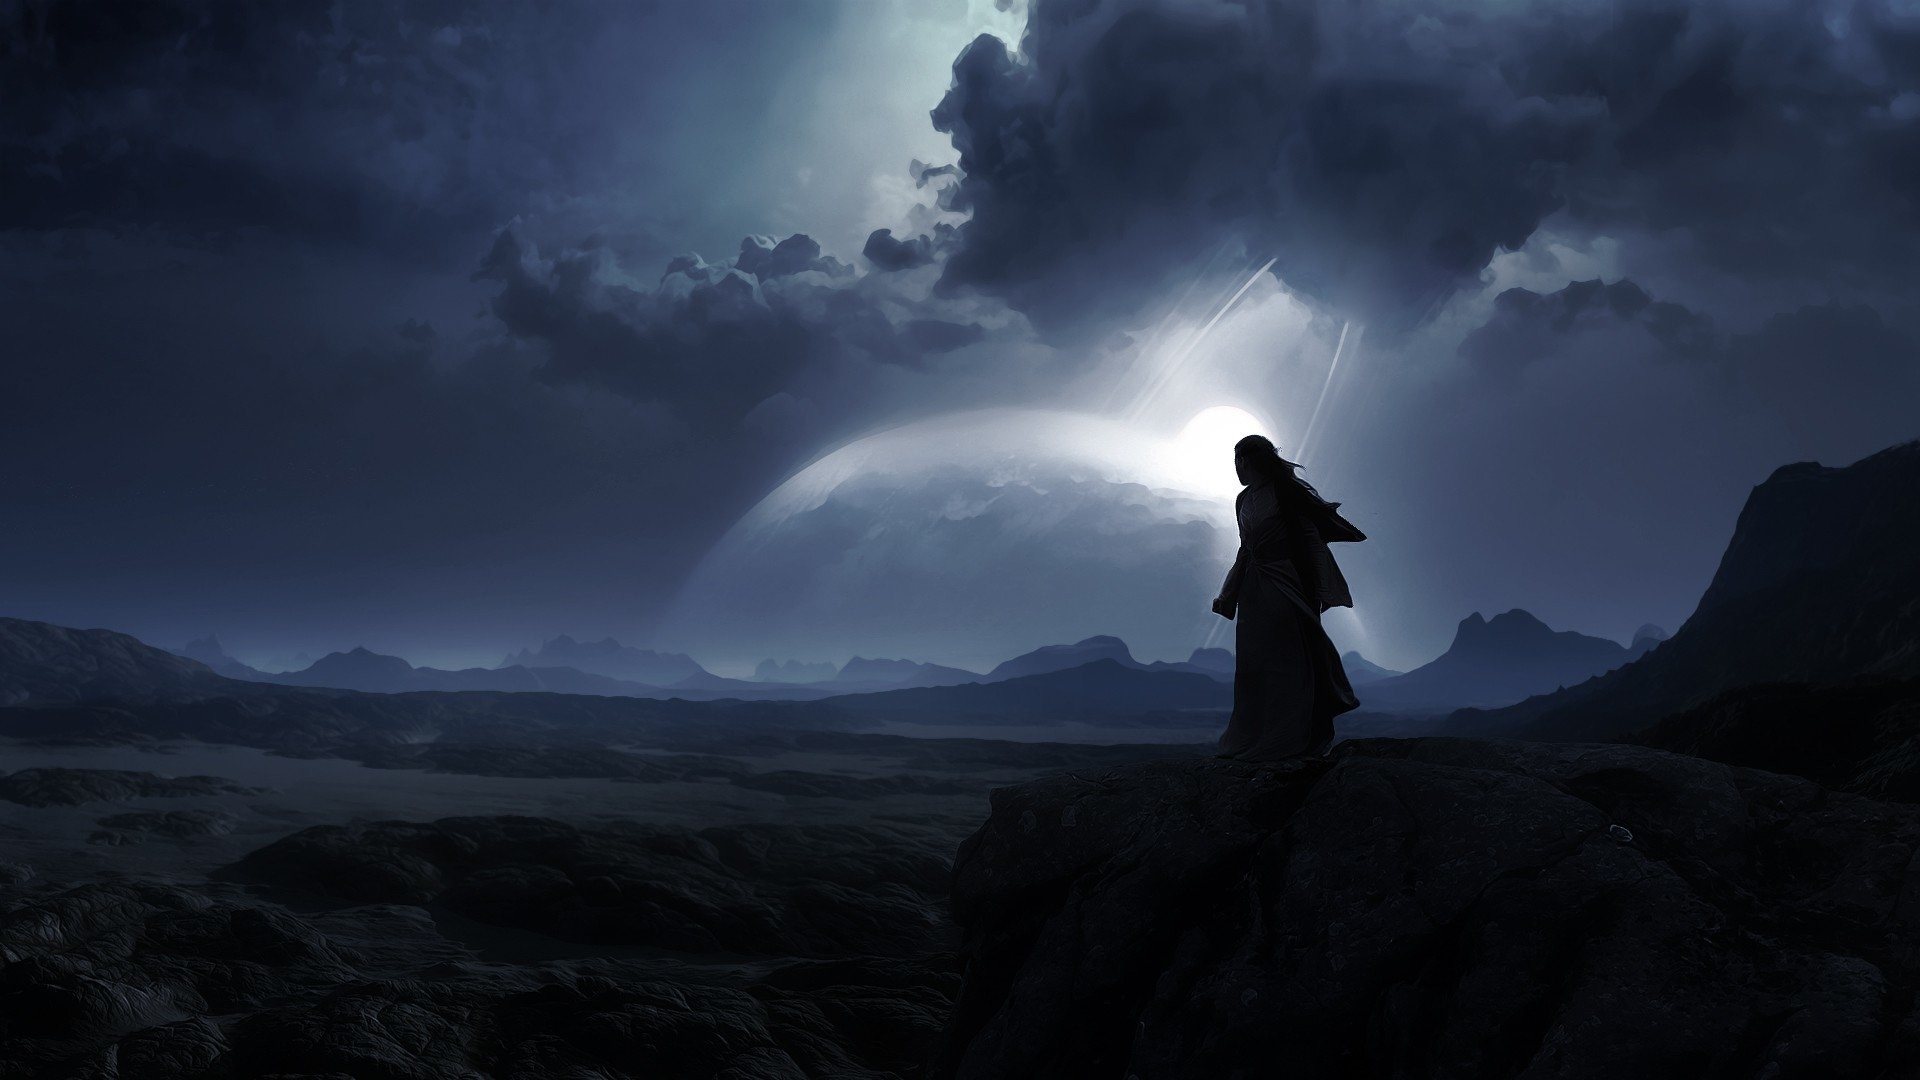 HD Wallpaper   Background ID:424441. Sci Fi Landscape